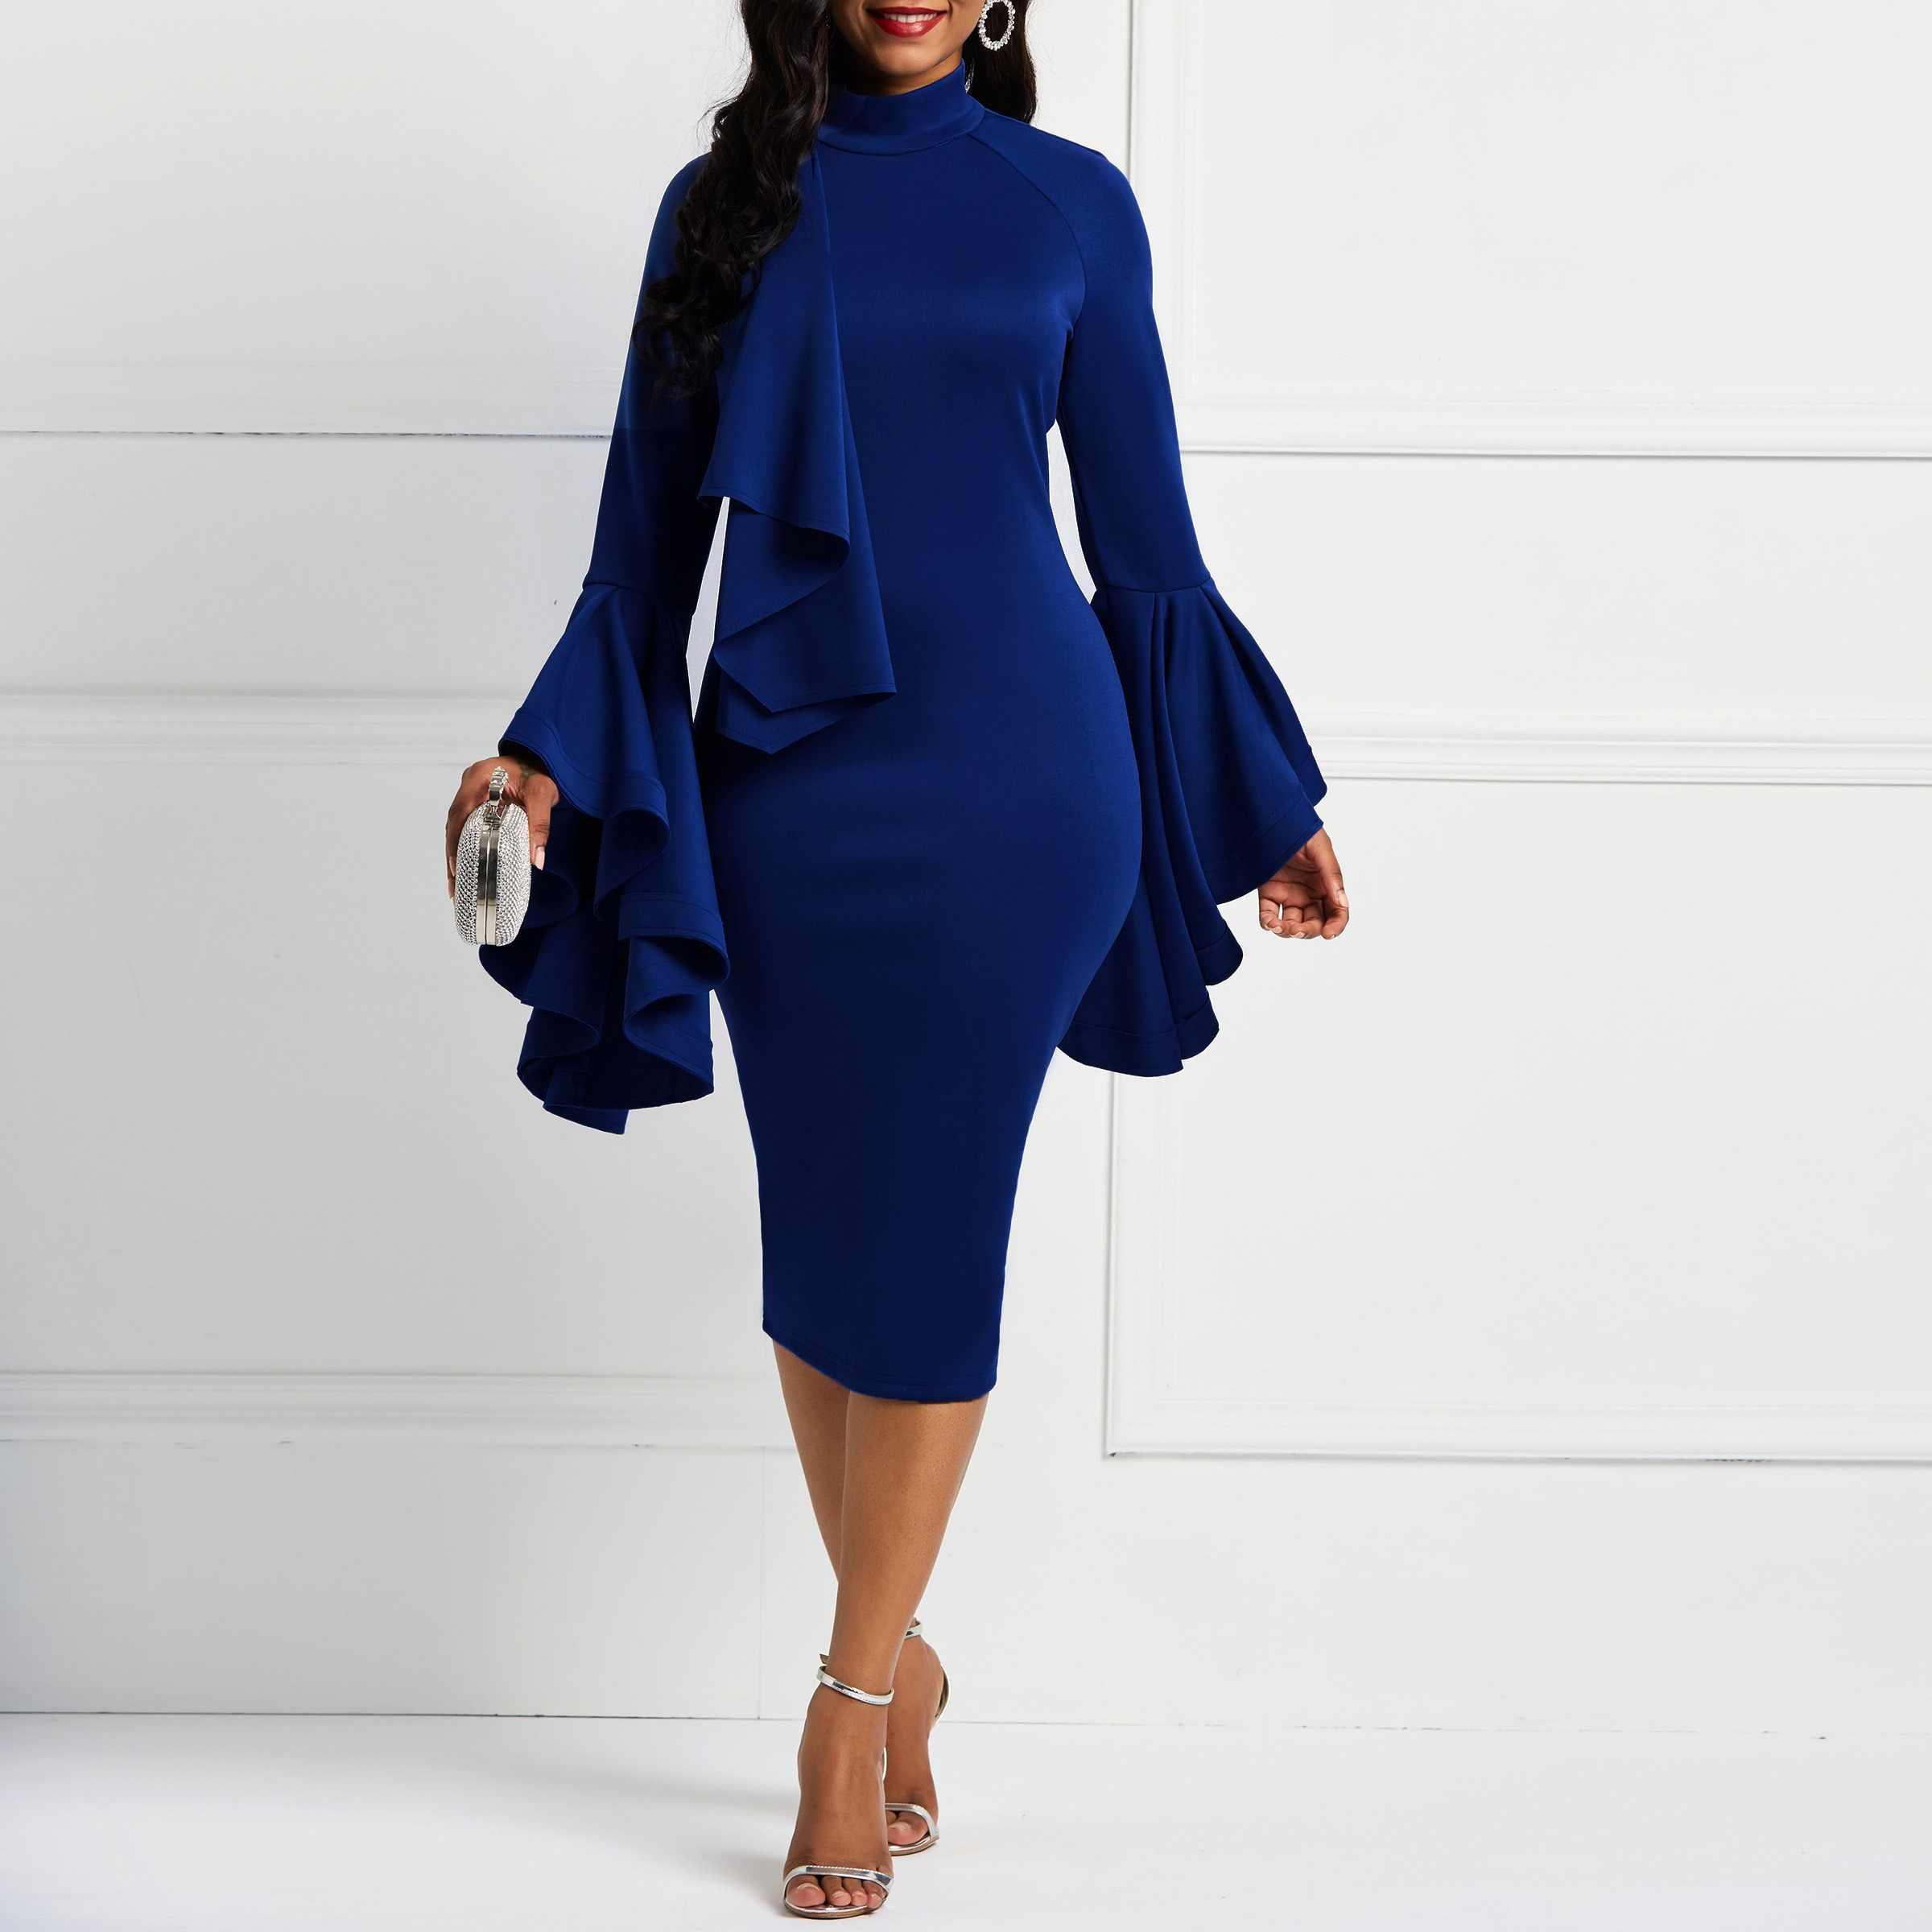 8e2263afe161 Women Long Flared Sleeves Bowknot Knee-Length Bodycon midi Dresses Elegant  Female Navy Christamas Party